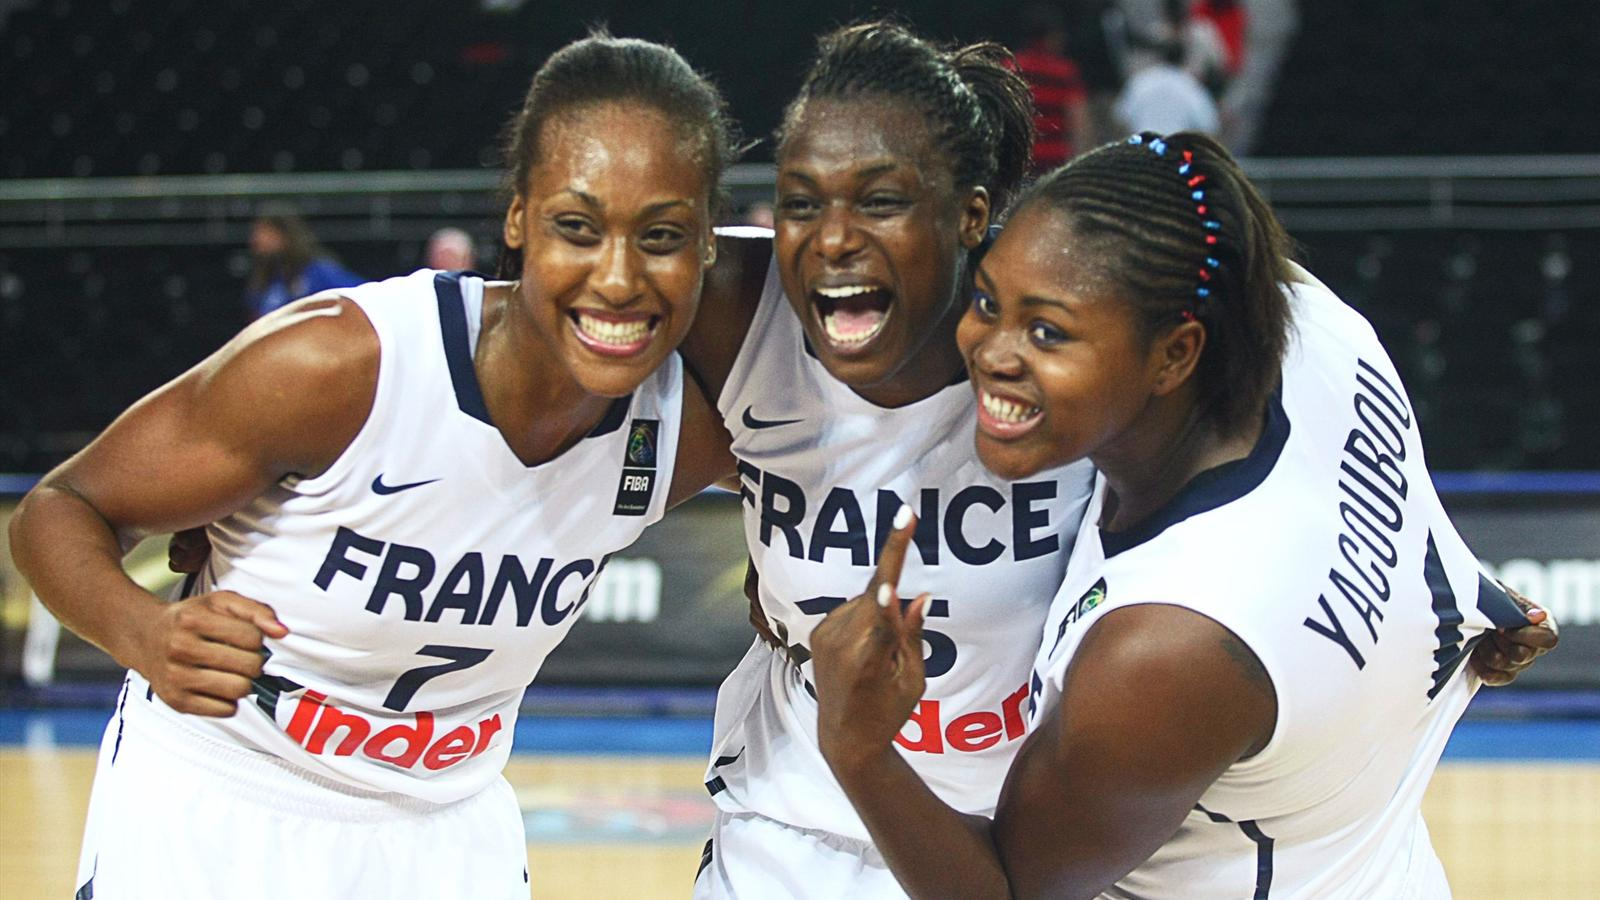 mondial basket f u00e9minin  match france vs turquie en direct